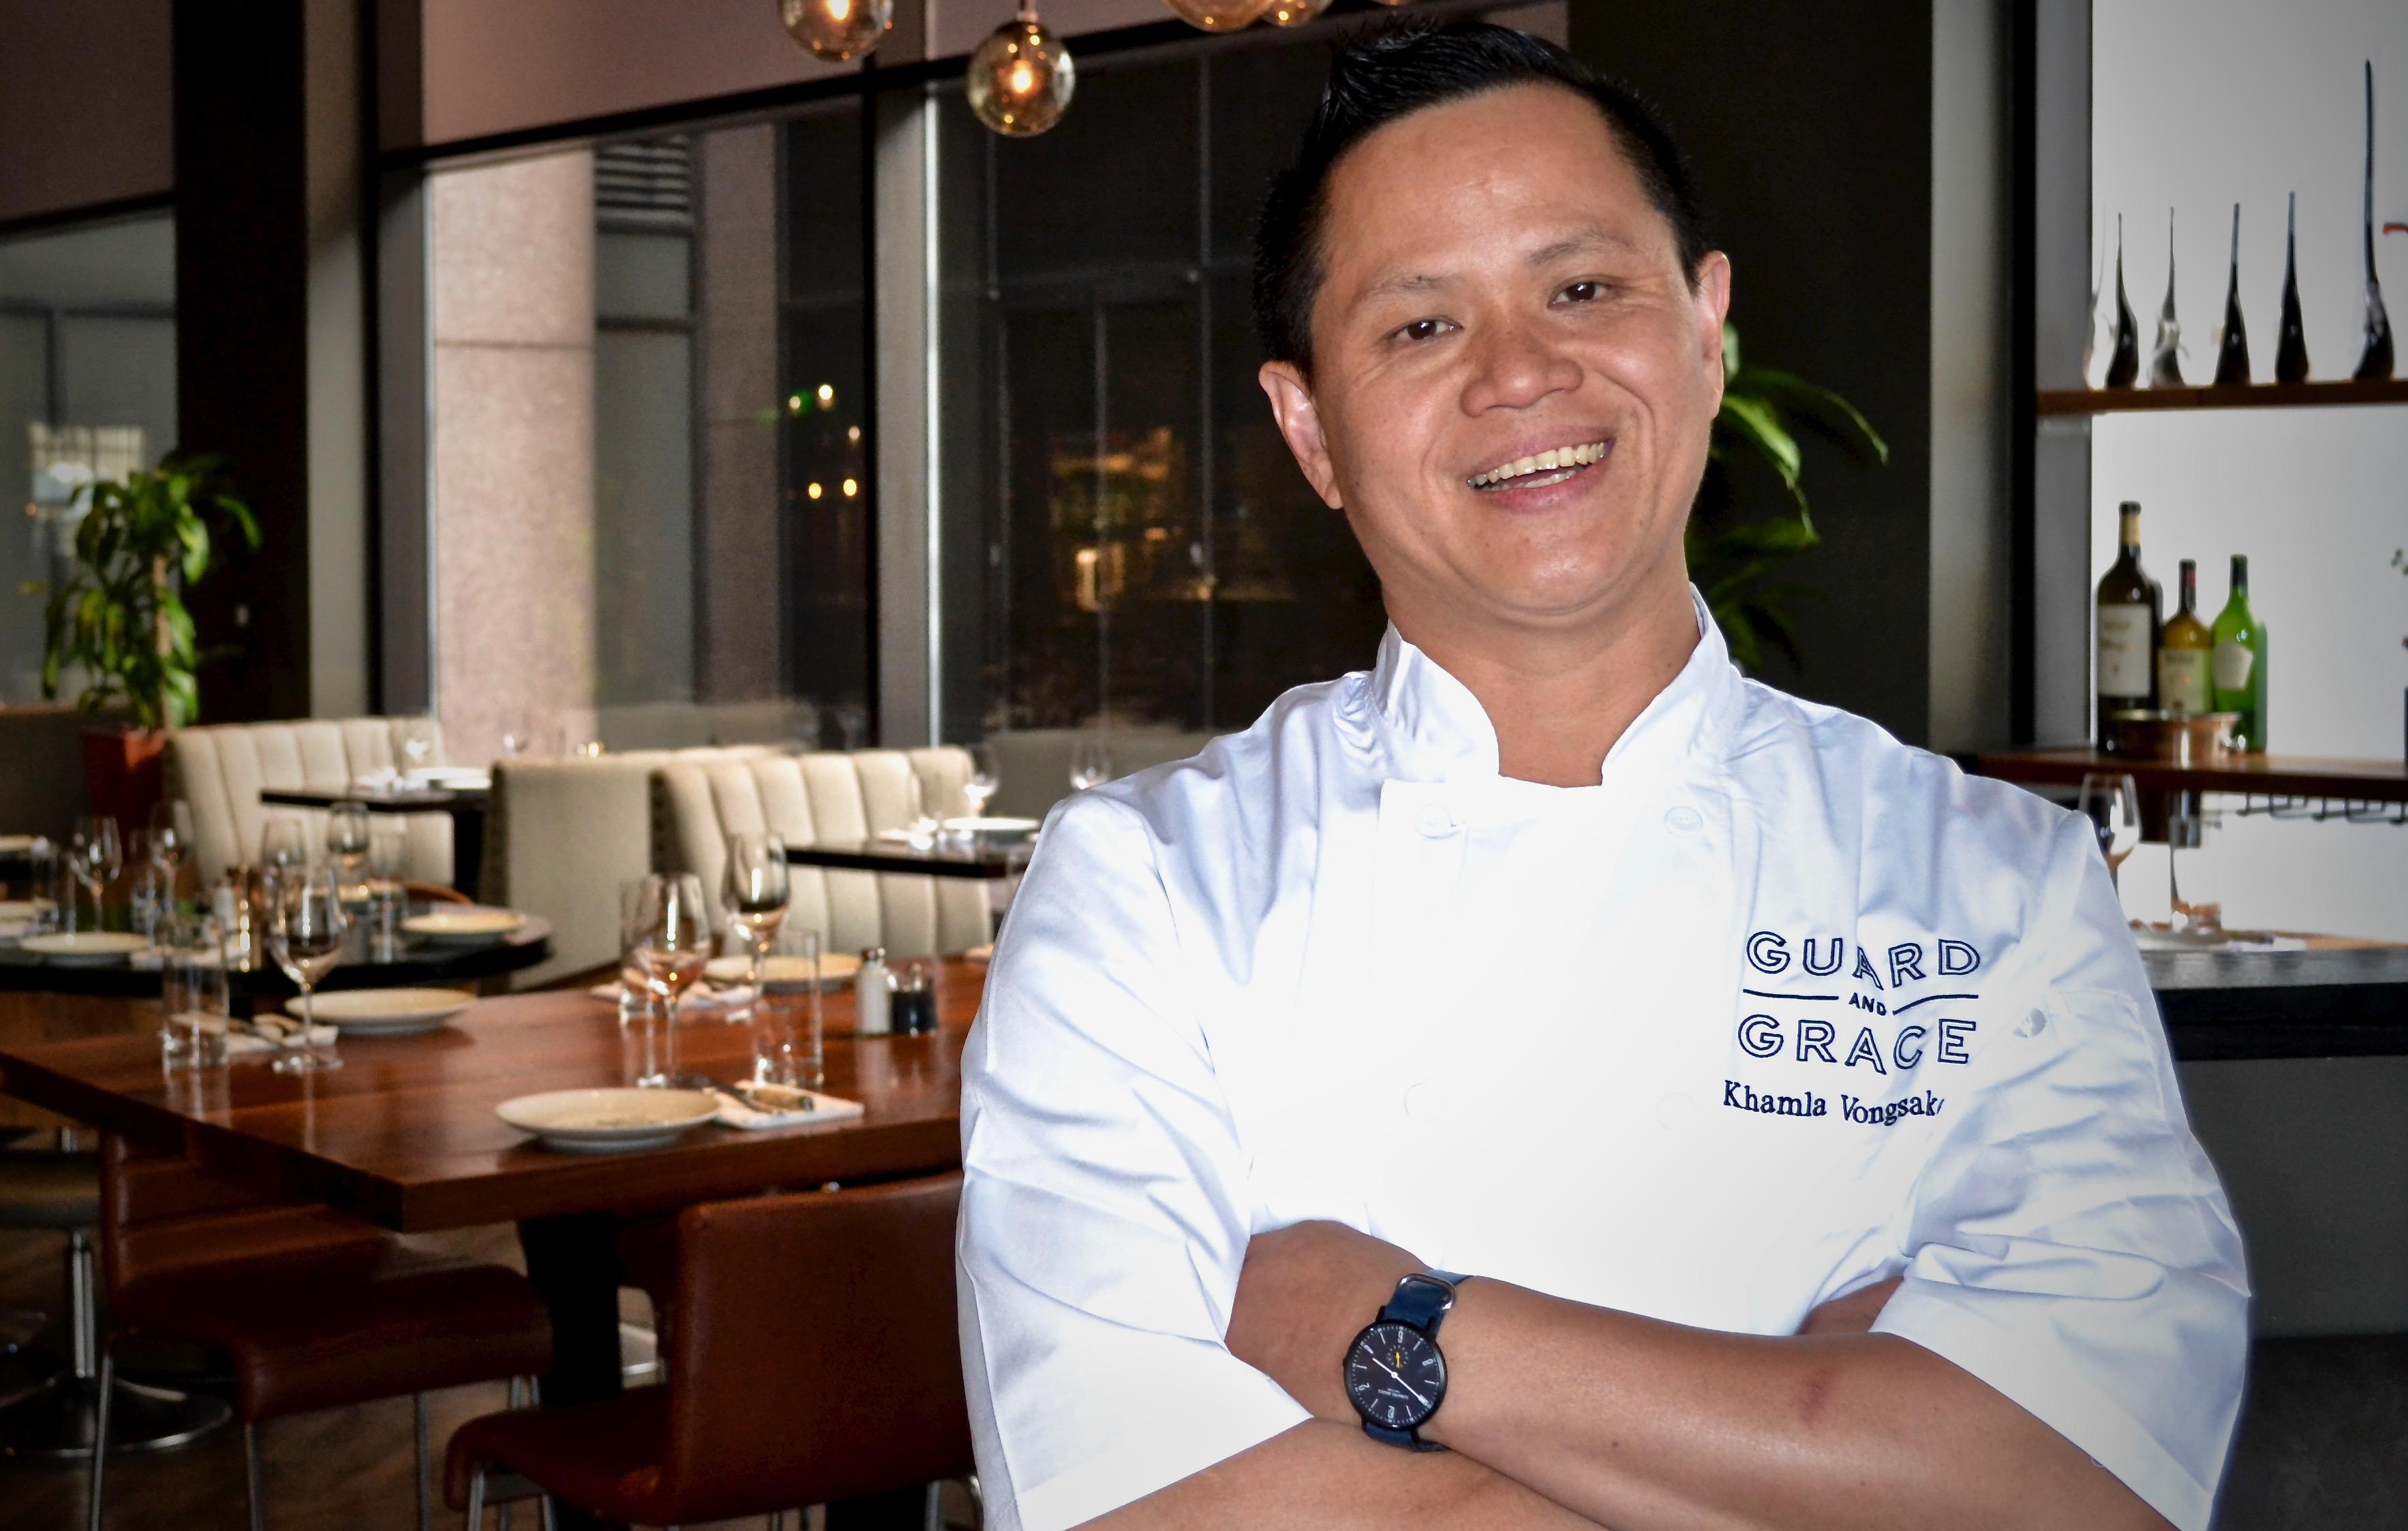 Guard & Grace Lands a New Executive Chef